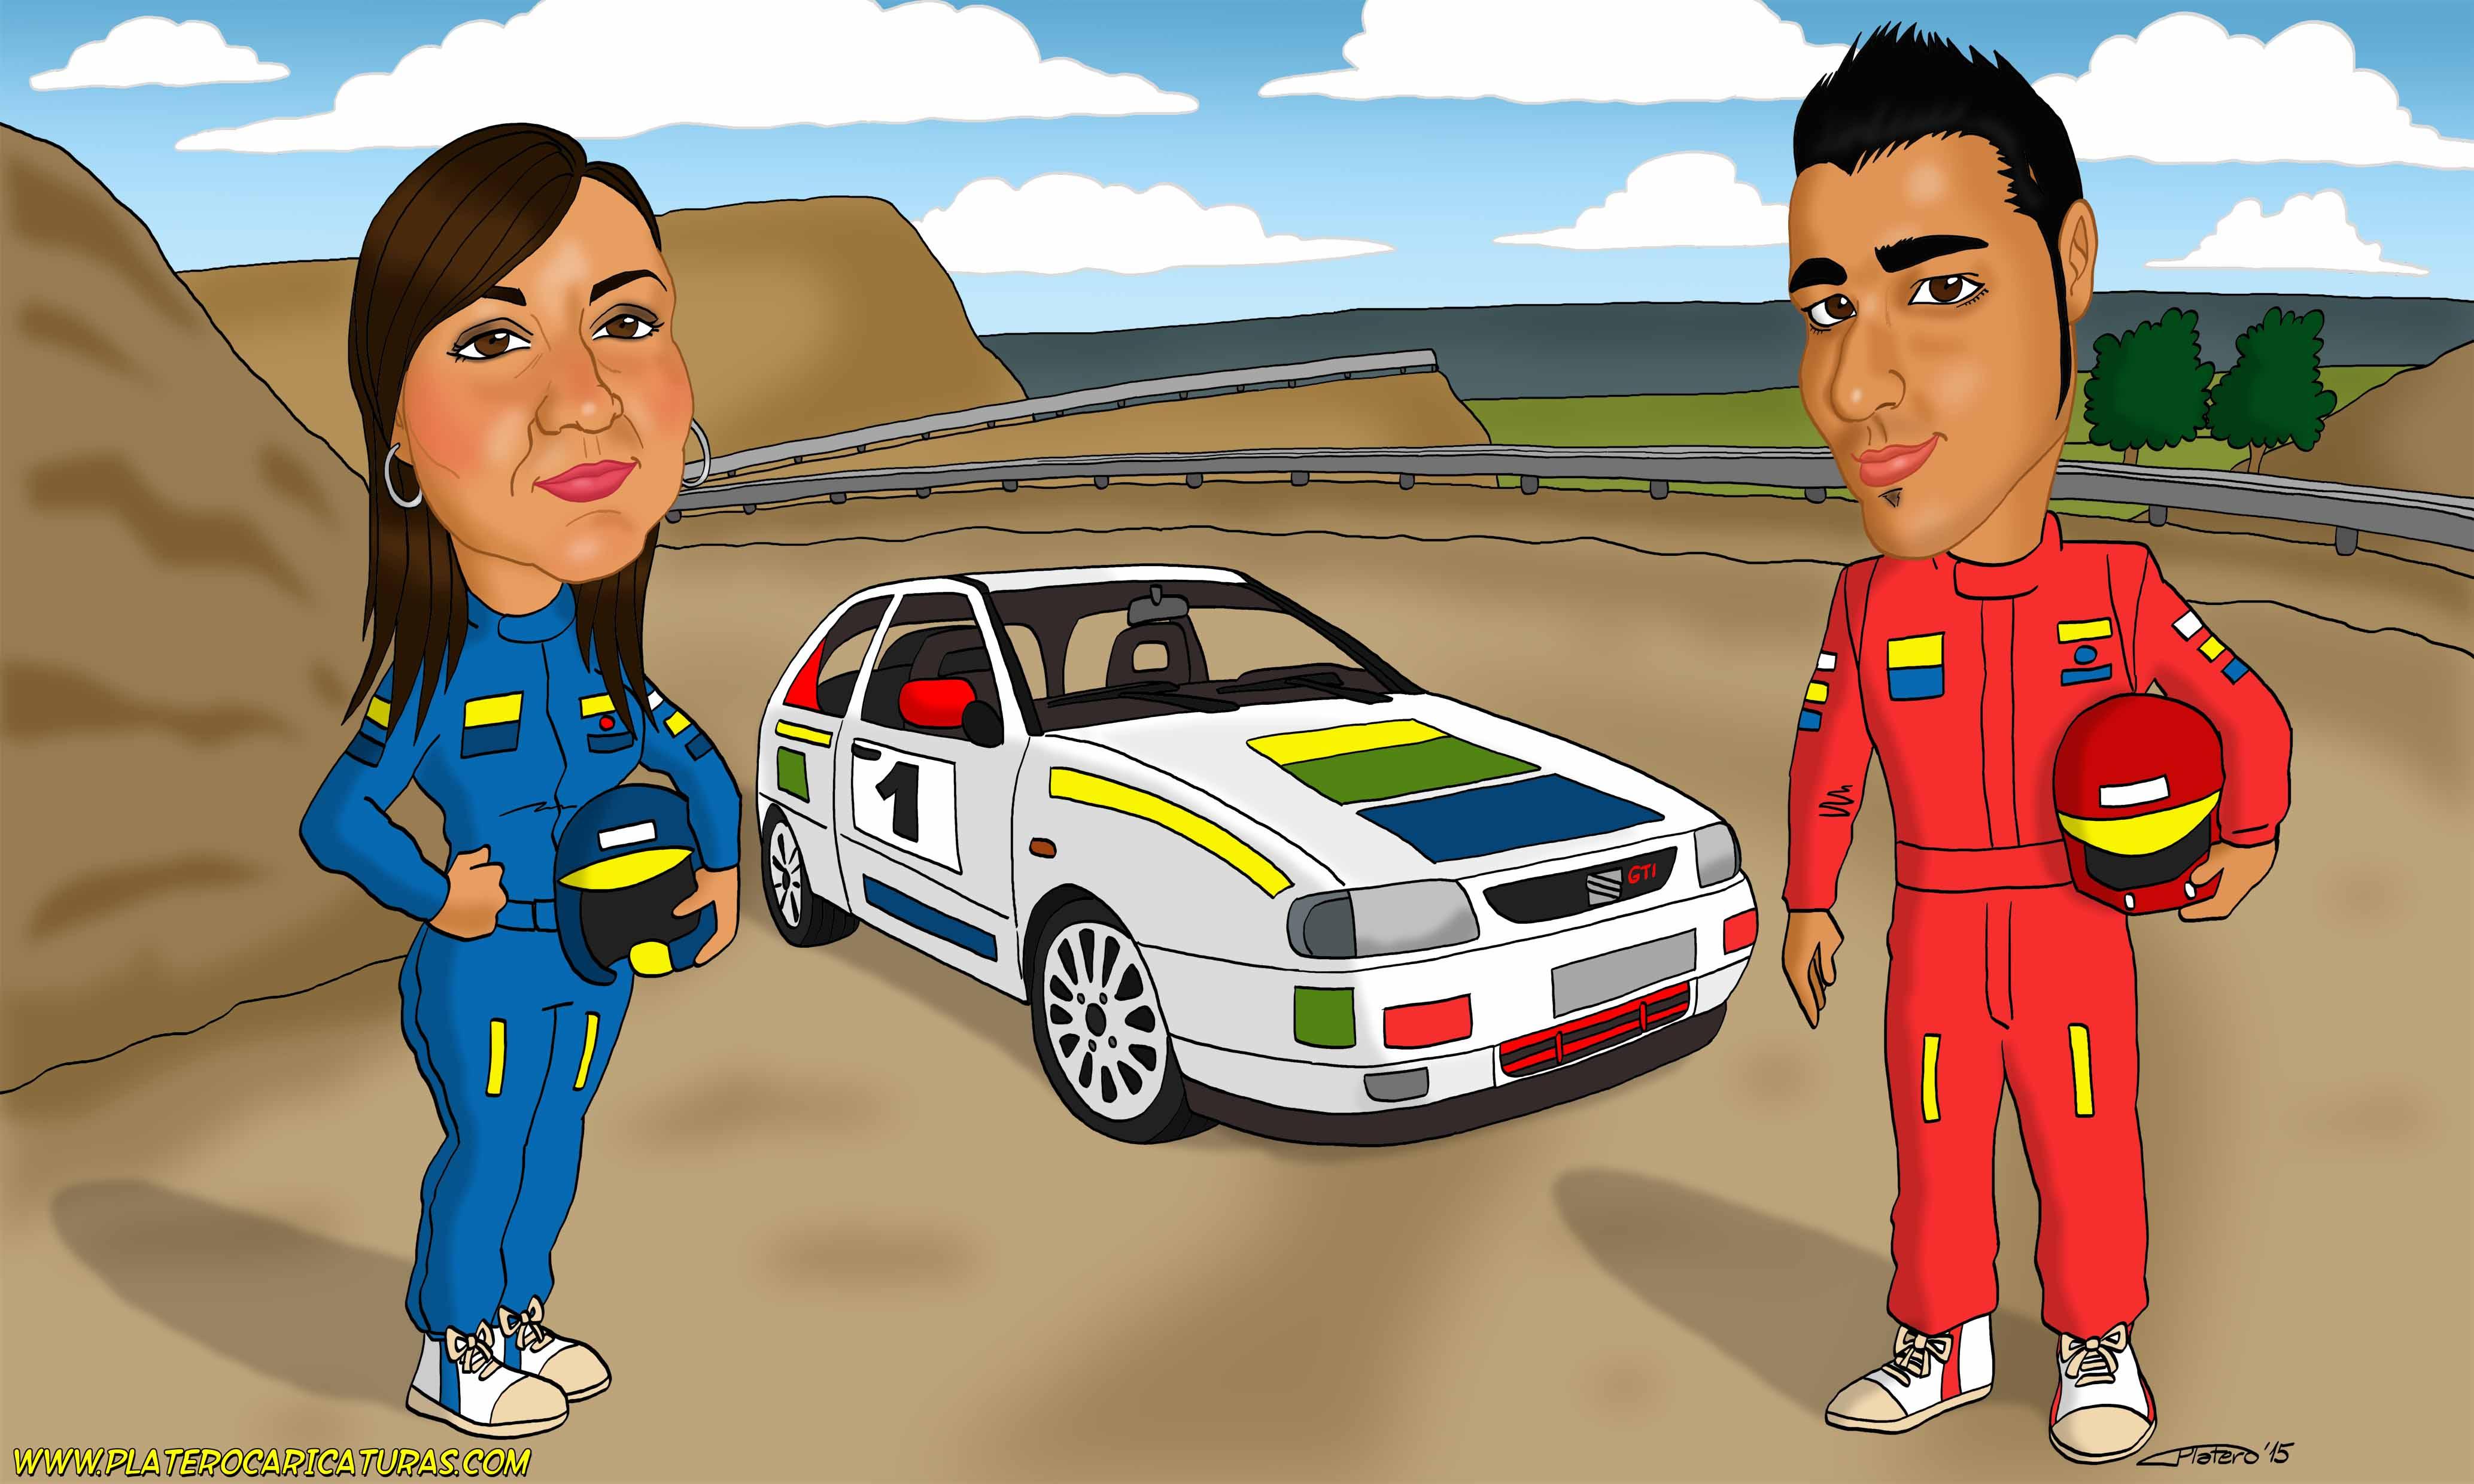 caricatura_a_color_por_encargo_personalizada_pareja_con_coche_de_rally_elmundode